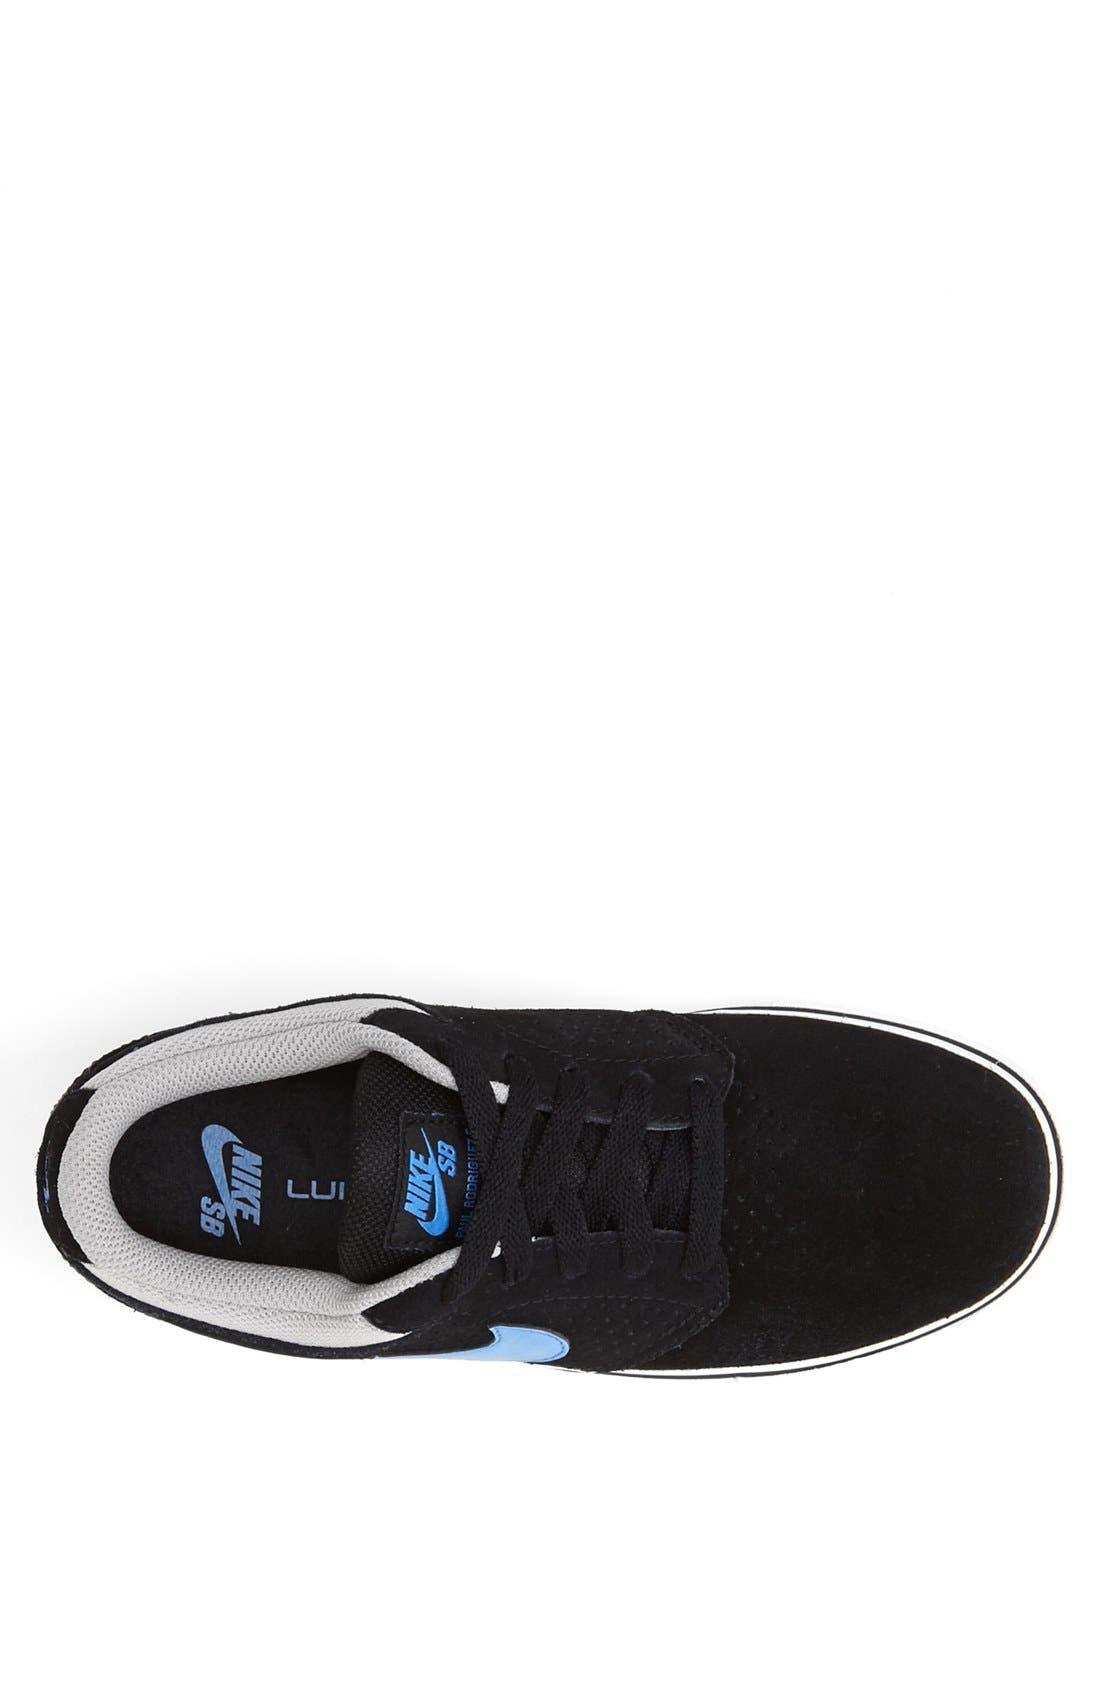 Alternate Image 3  - Nike 'Paul Rodriguez 5 LR' Sneaker (Men)